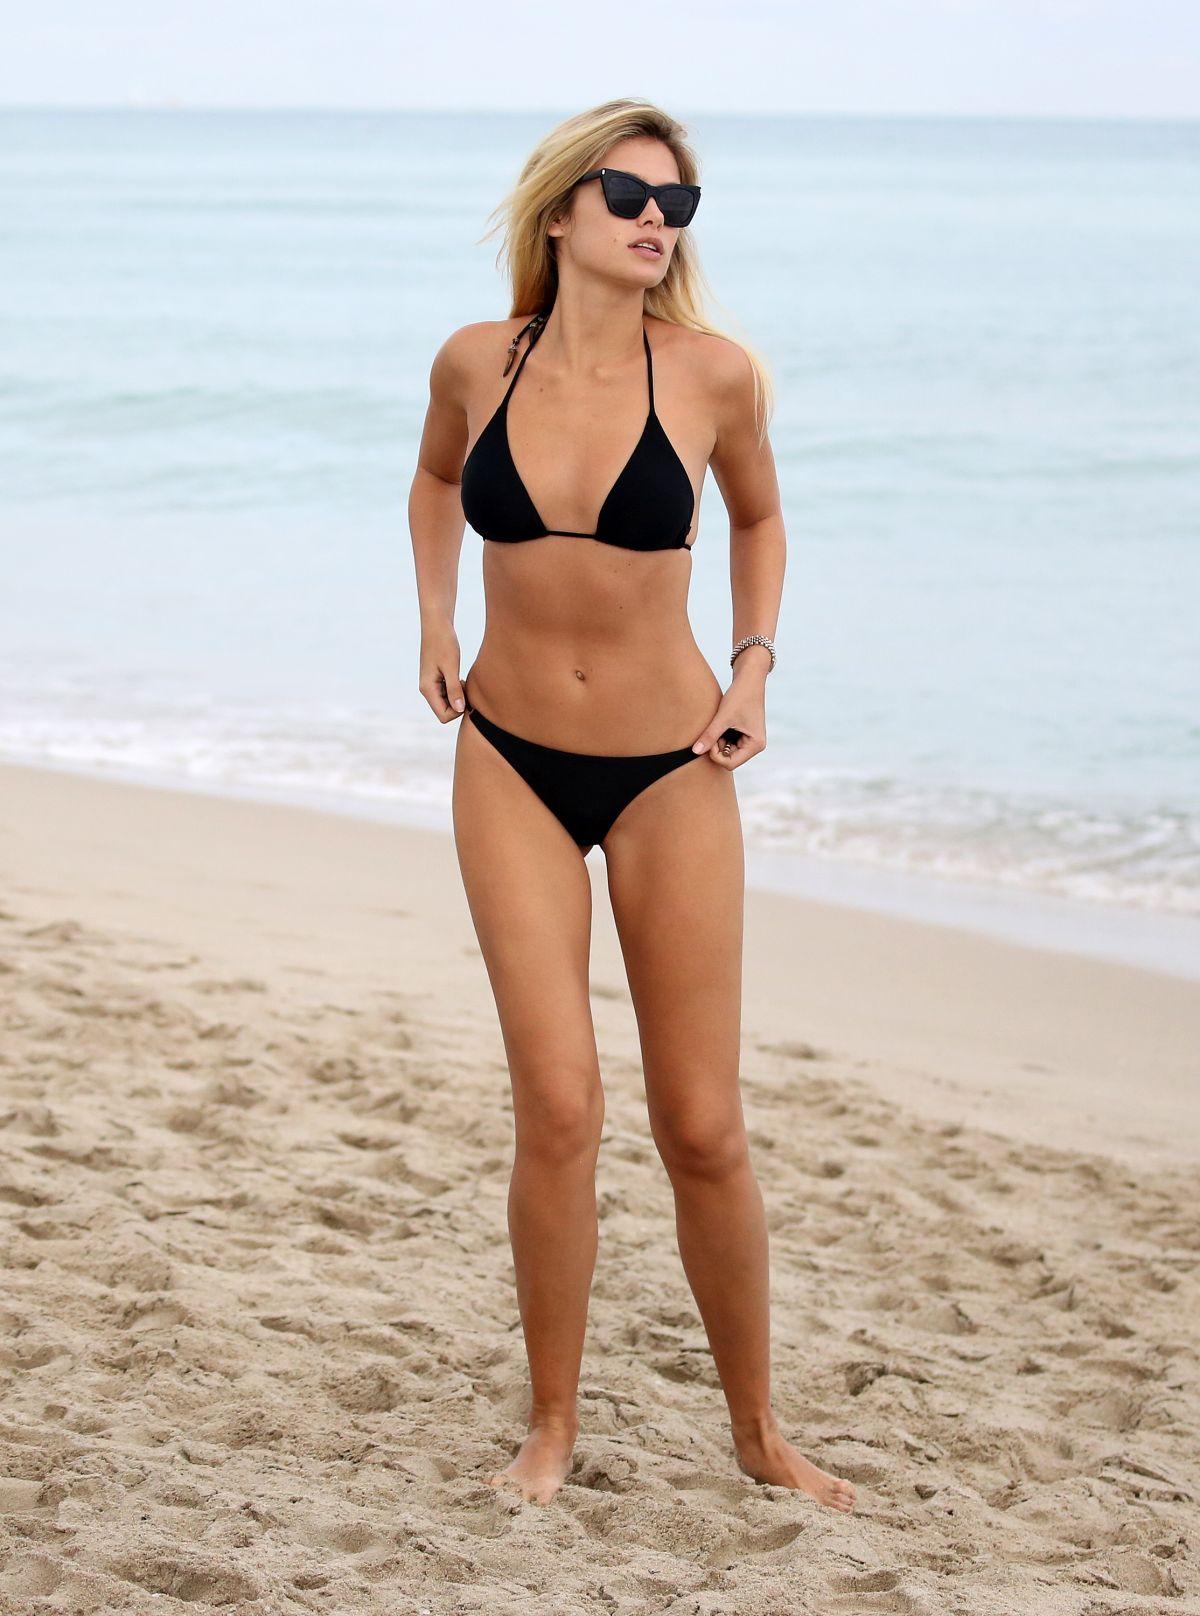 Bikini Lada Kravchenko naked (11 foto and video), Ass, Cleavage, Boobs, underwear 2019